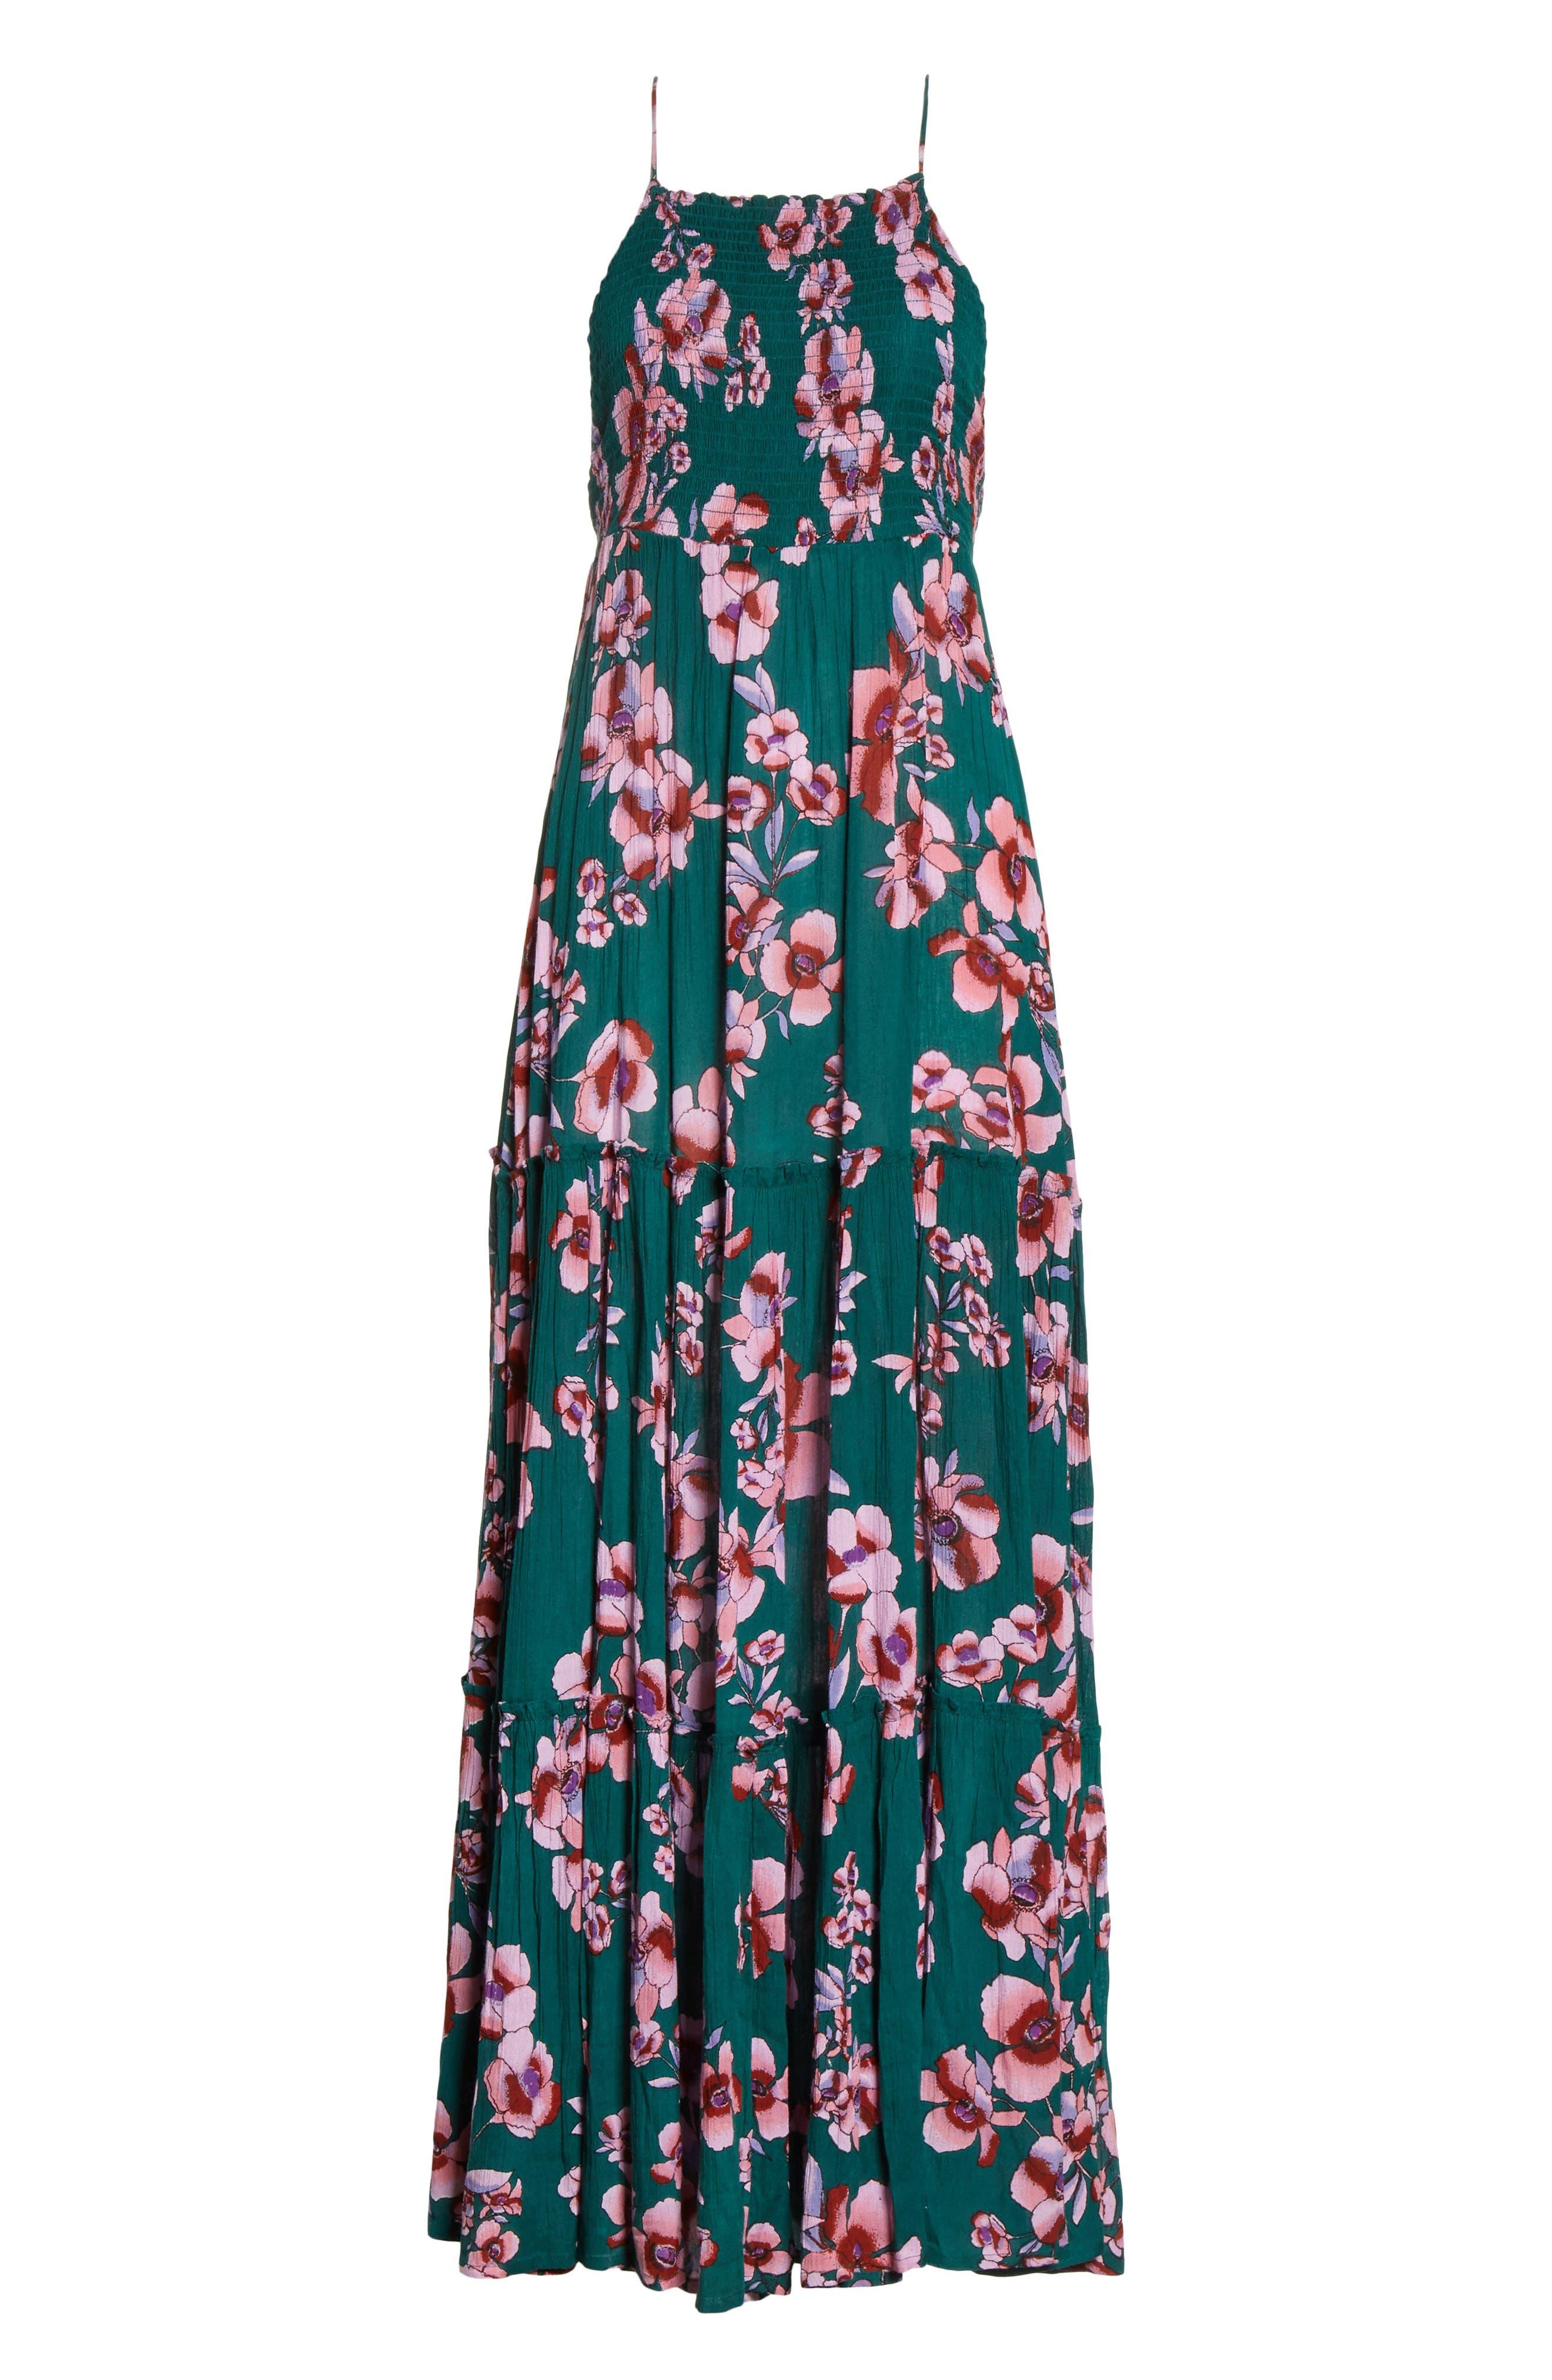 Garden Party Maxi Dress,                             Alternate thumbnail 6, color,                             Turquoise